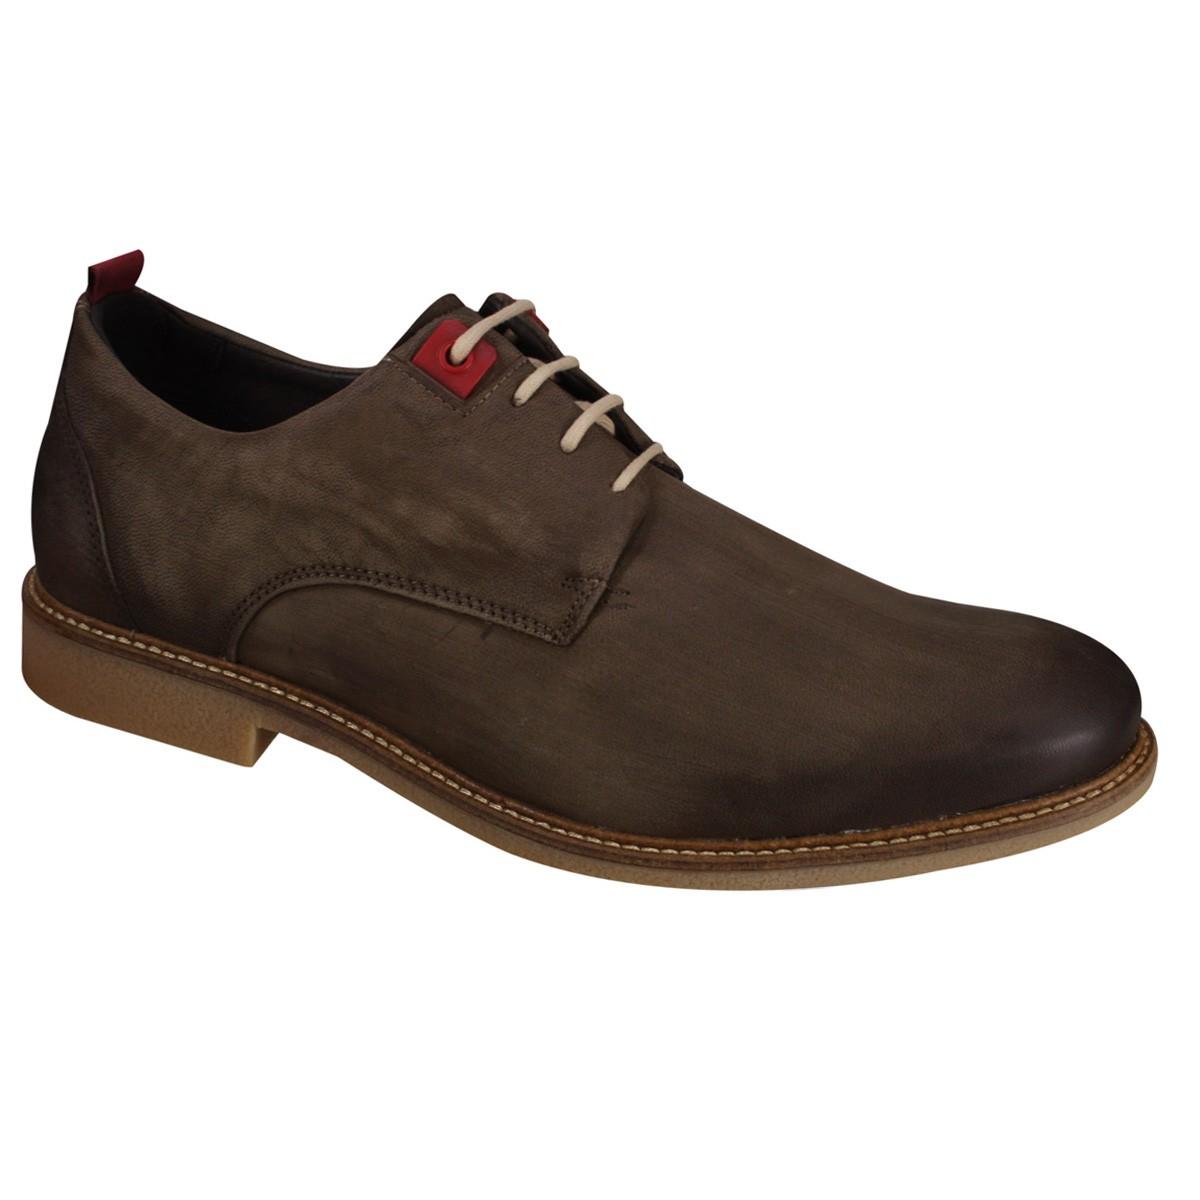 Ferracini Shoes Online